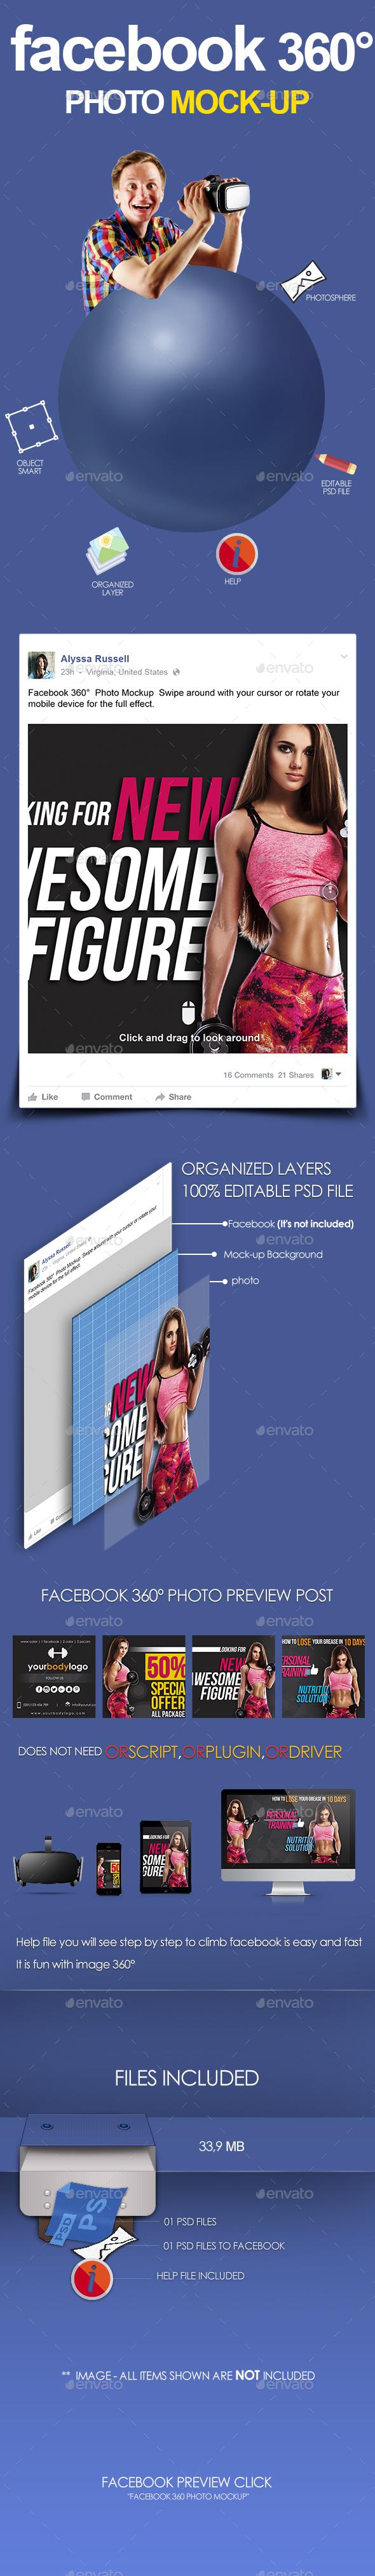 Facebook 360 Photo Graphics, Designs & Templates